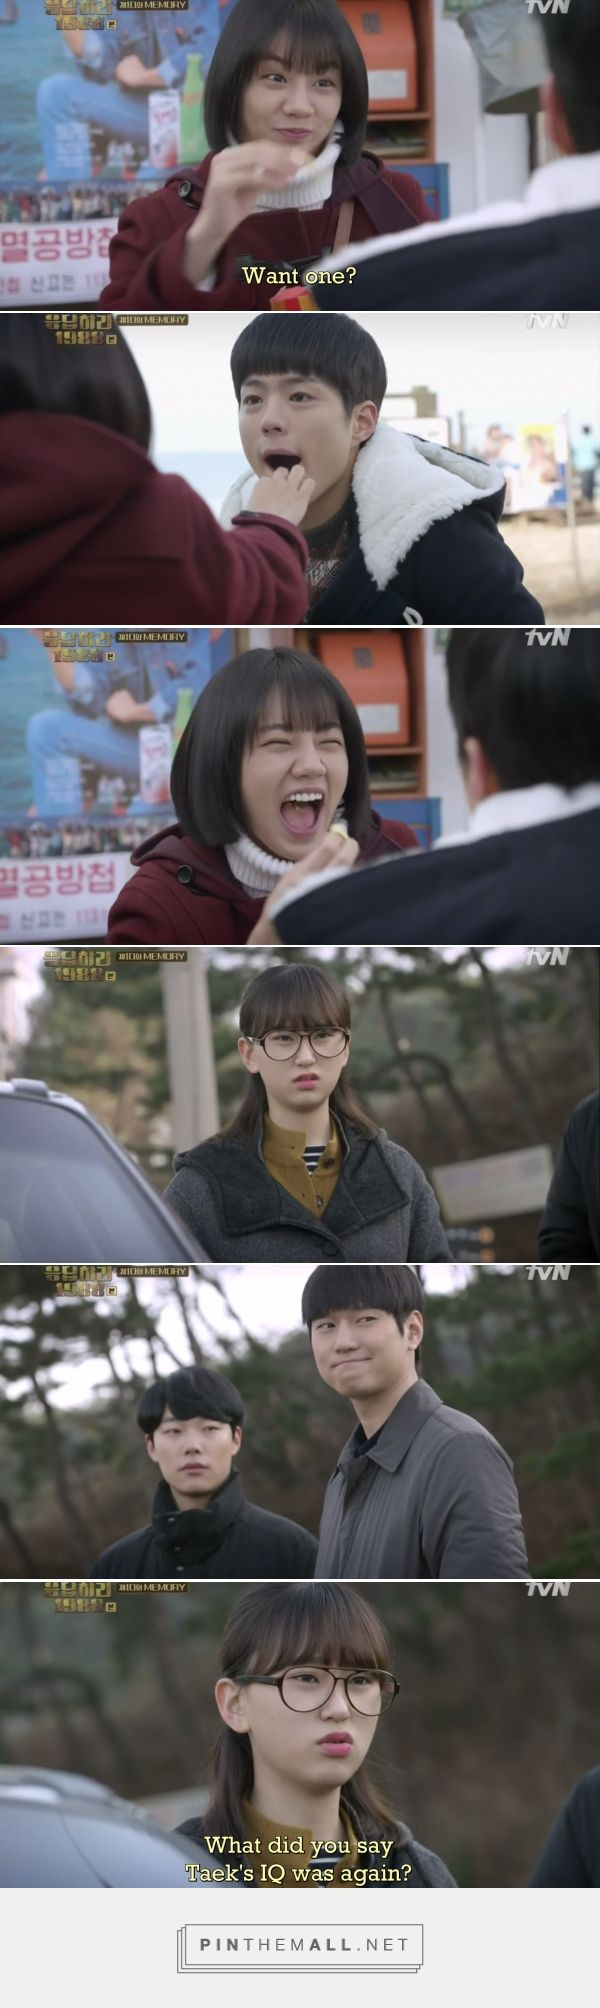 #reply 1988 #korean #drama Get more info here: https://goo.gl/nIOeX9  Taek IQ of cuteness overload! :D